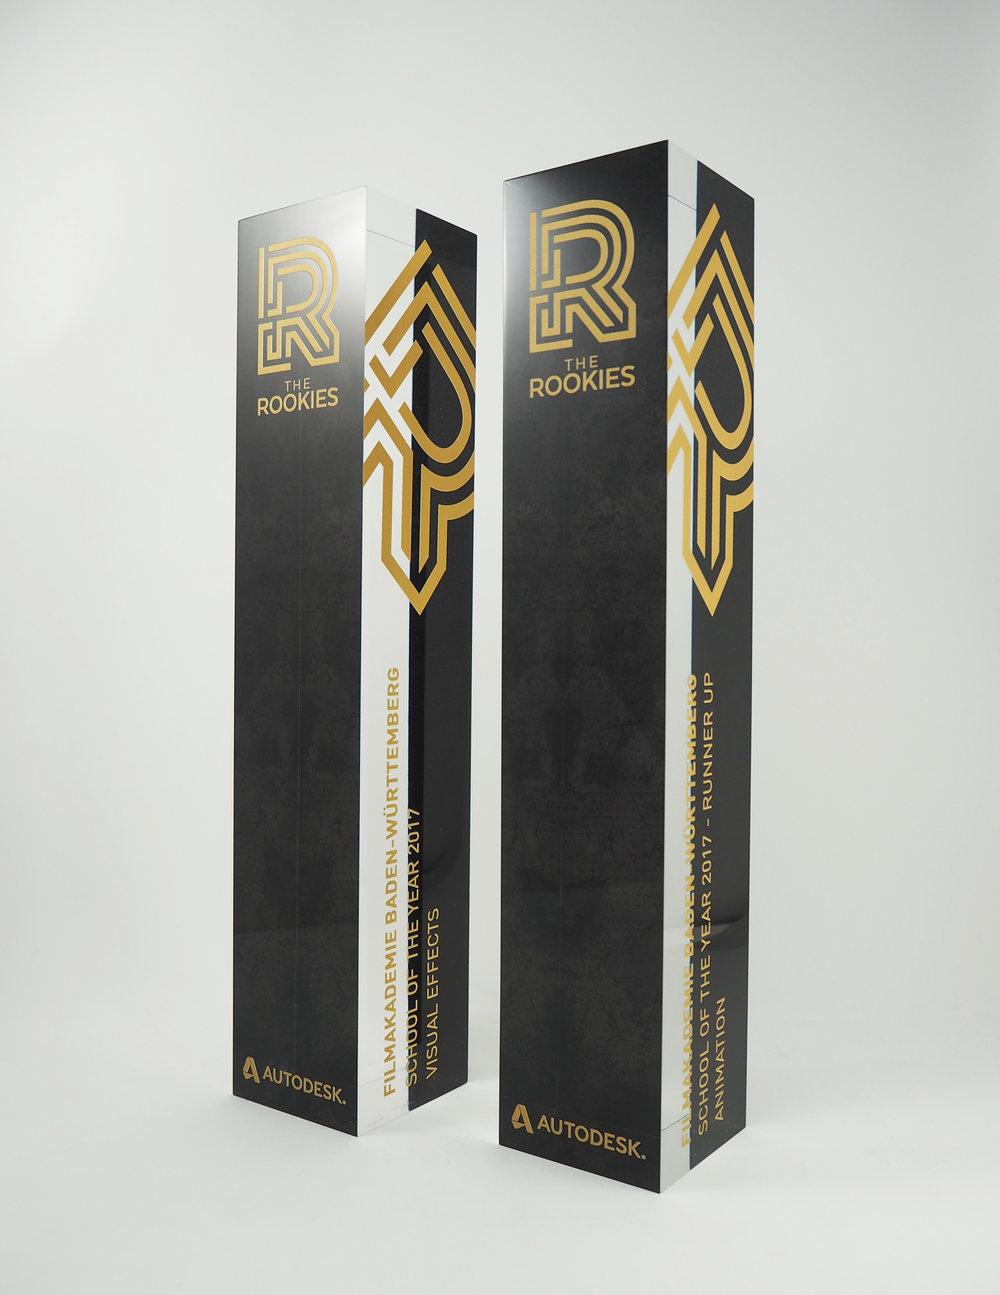 Rookies-art-acrylic-trophy-awards-06.jpg